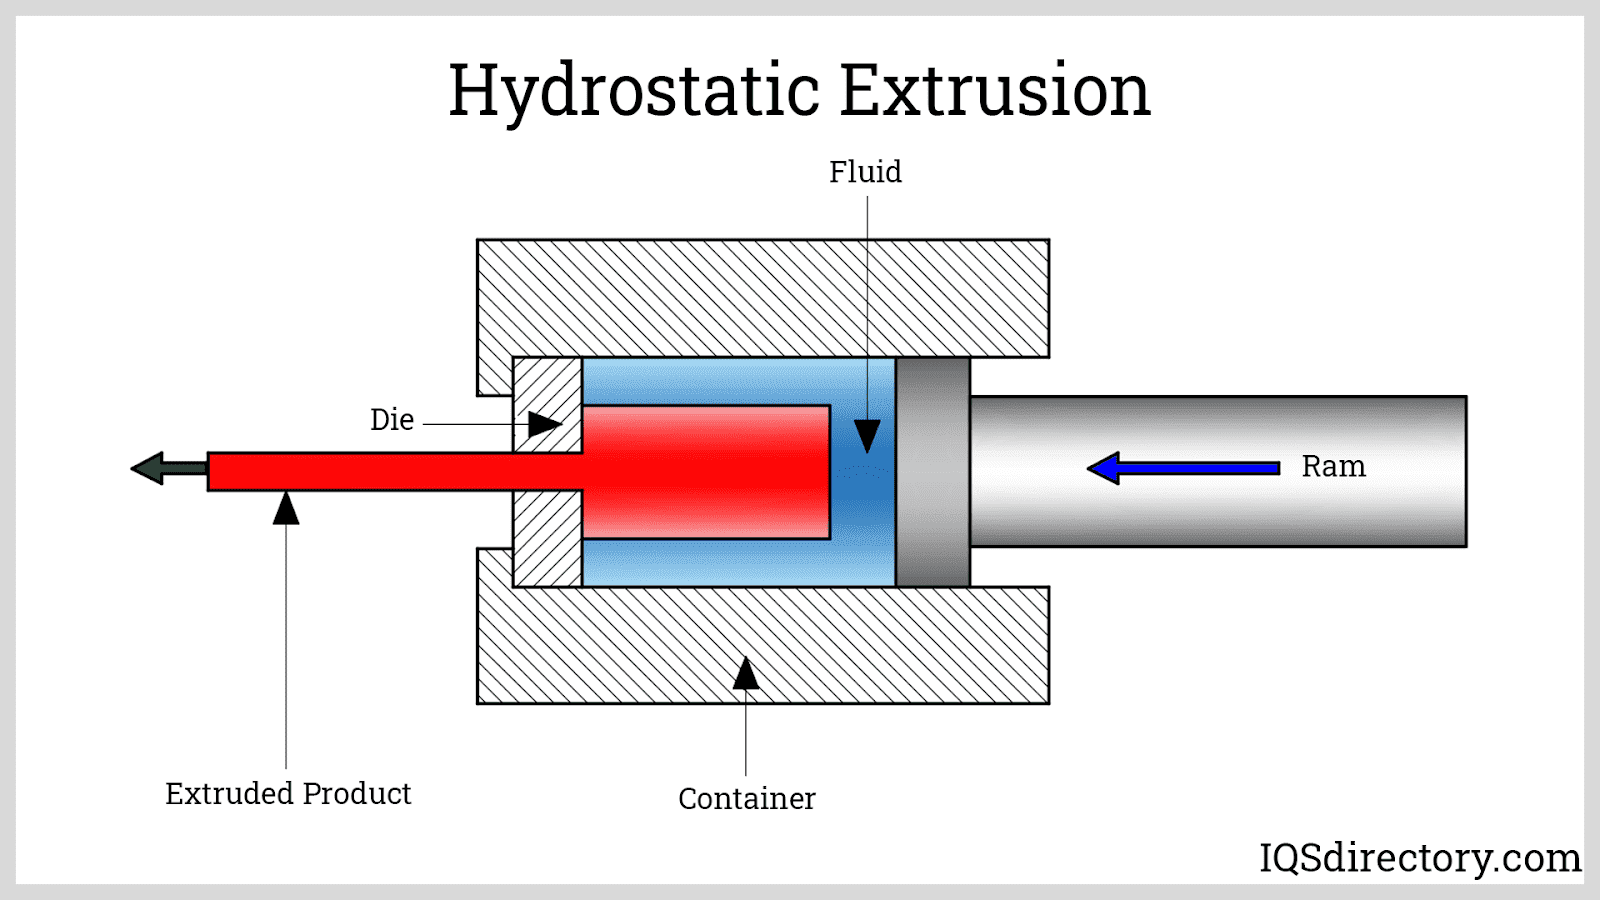 Hydrostatic Extrusion